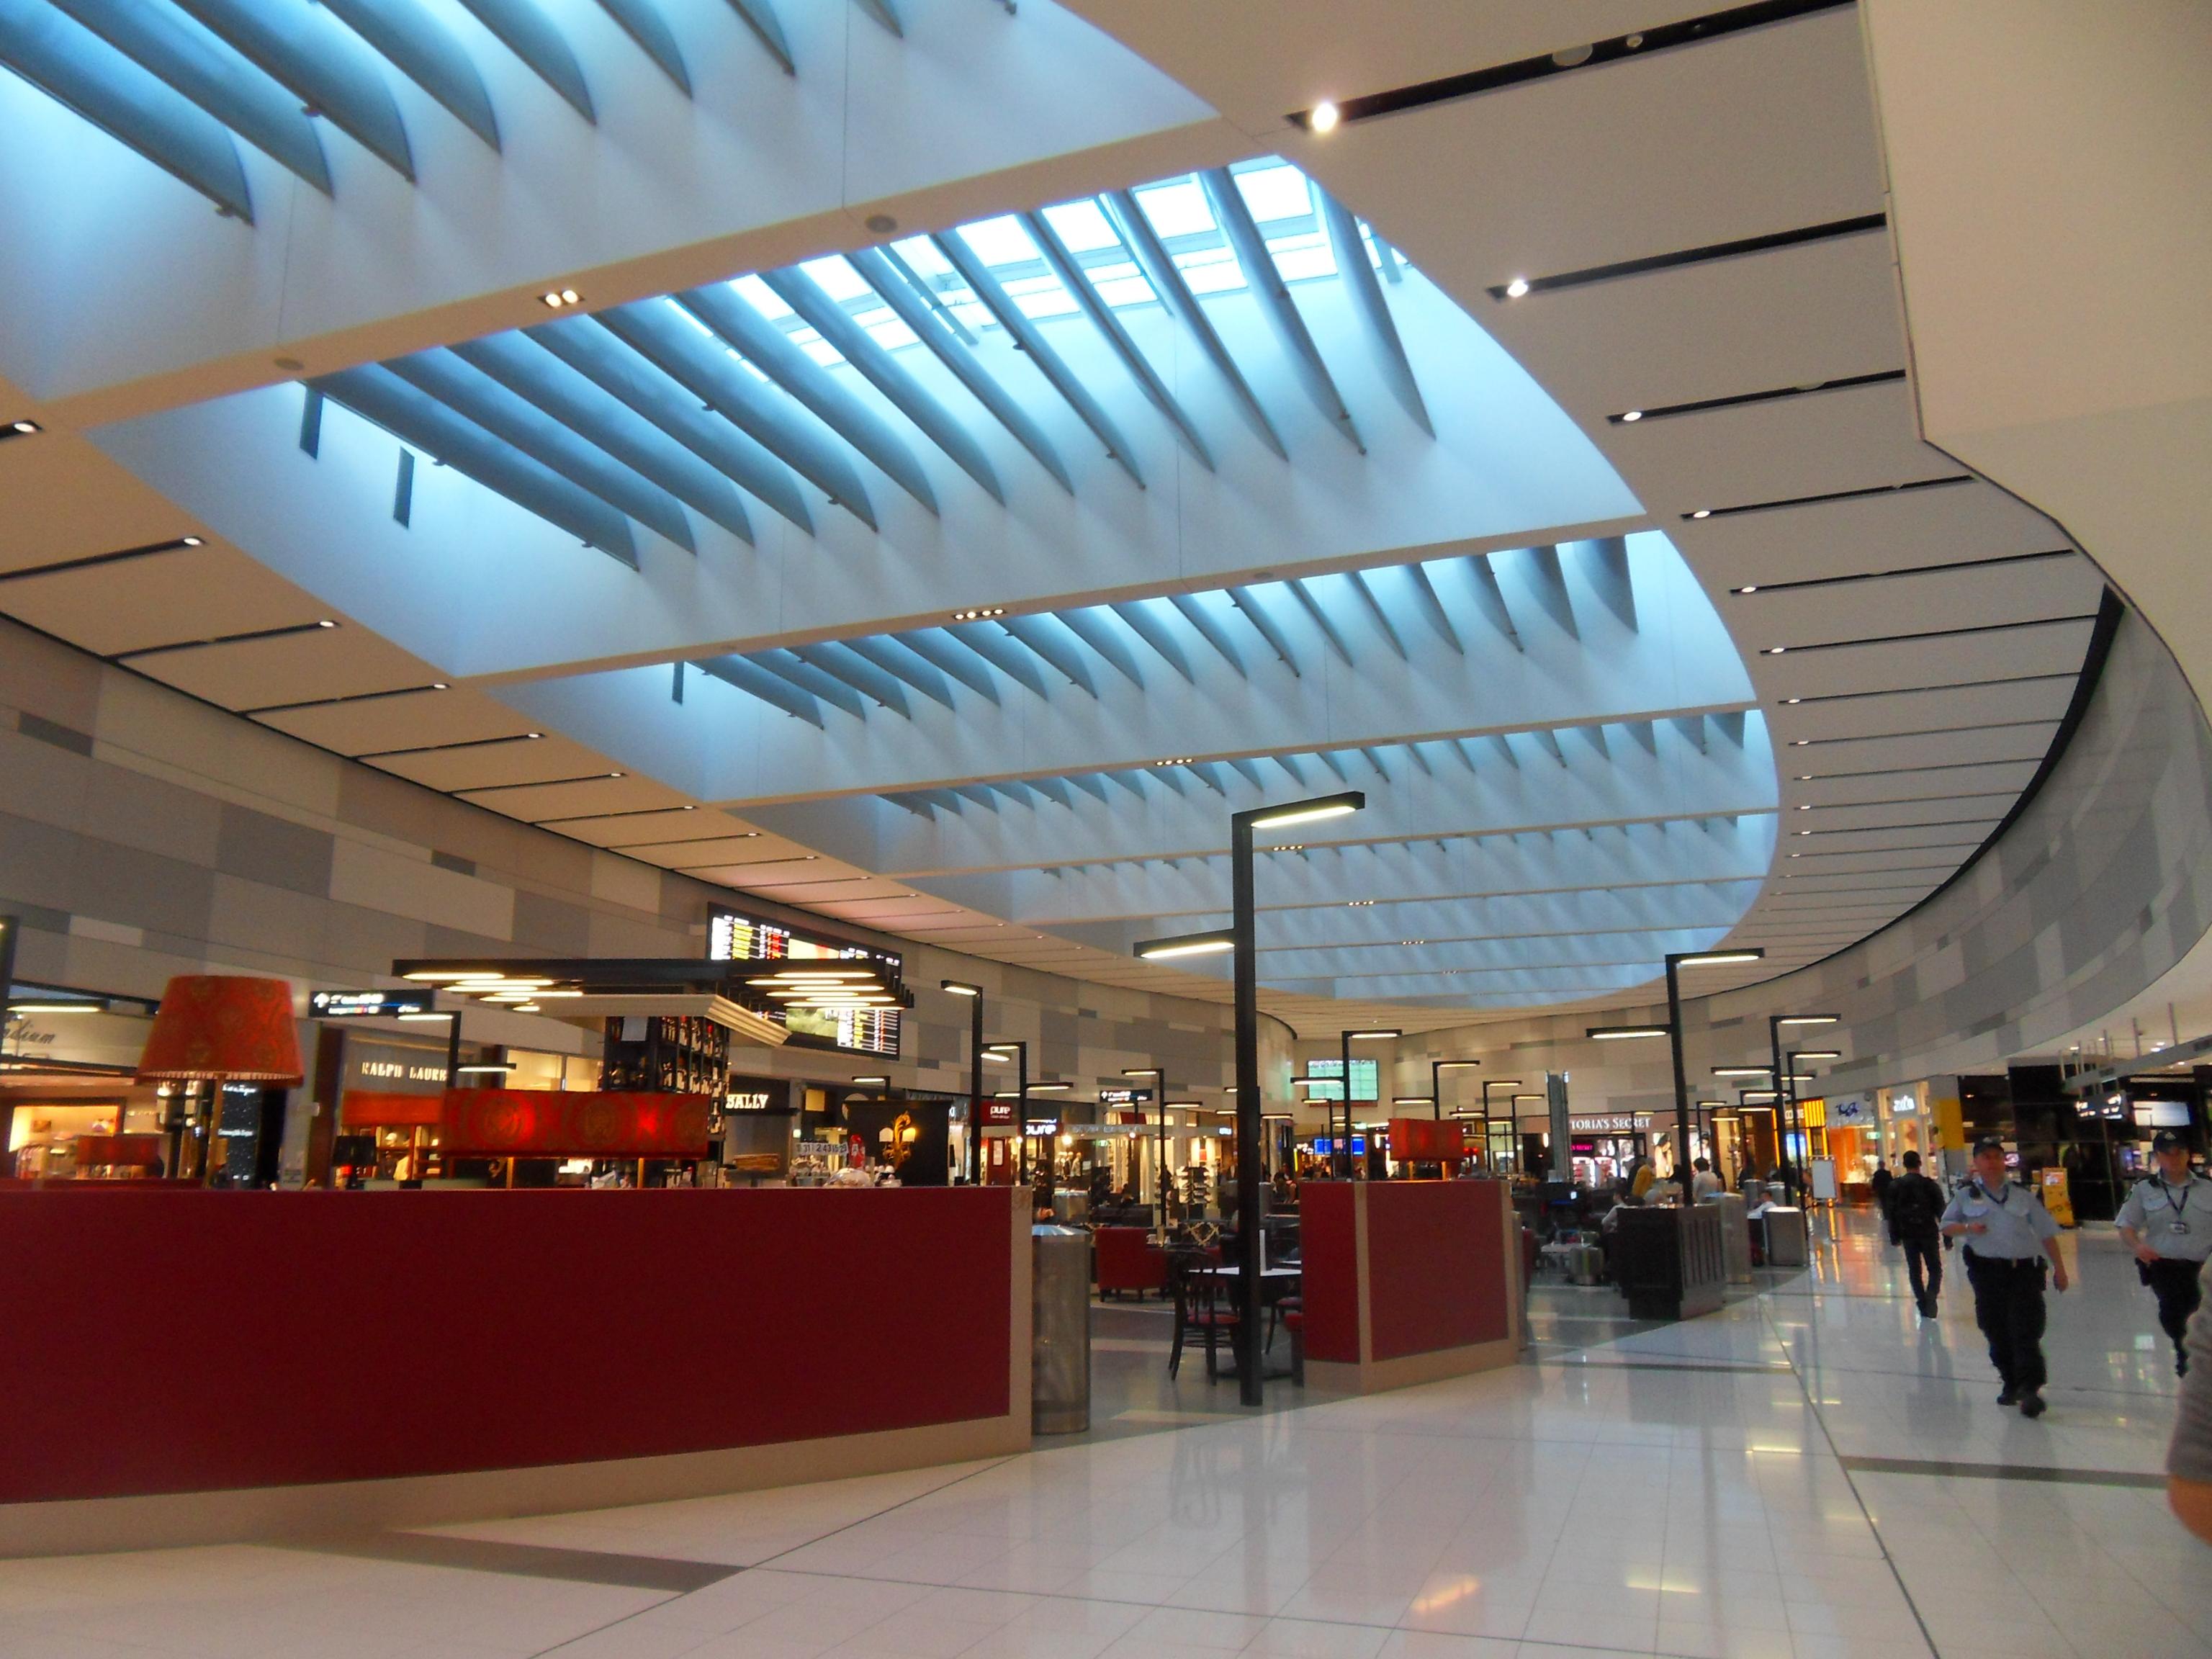 sydney airport - photo #44